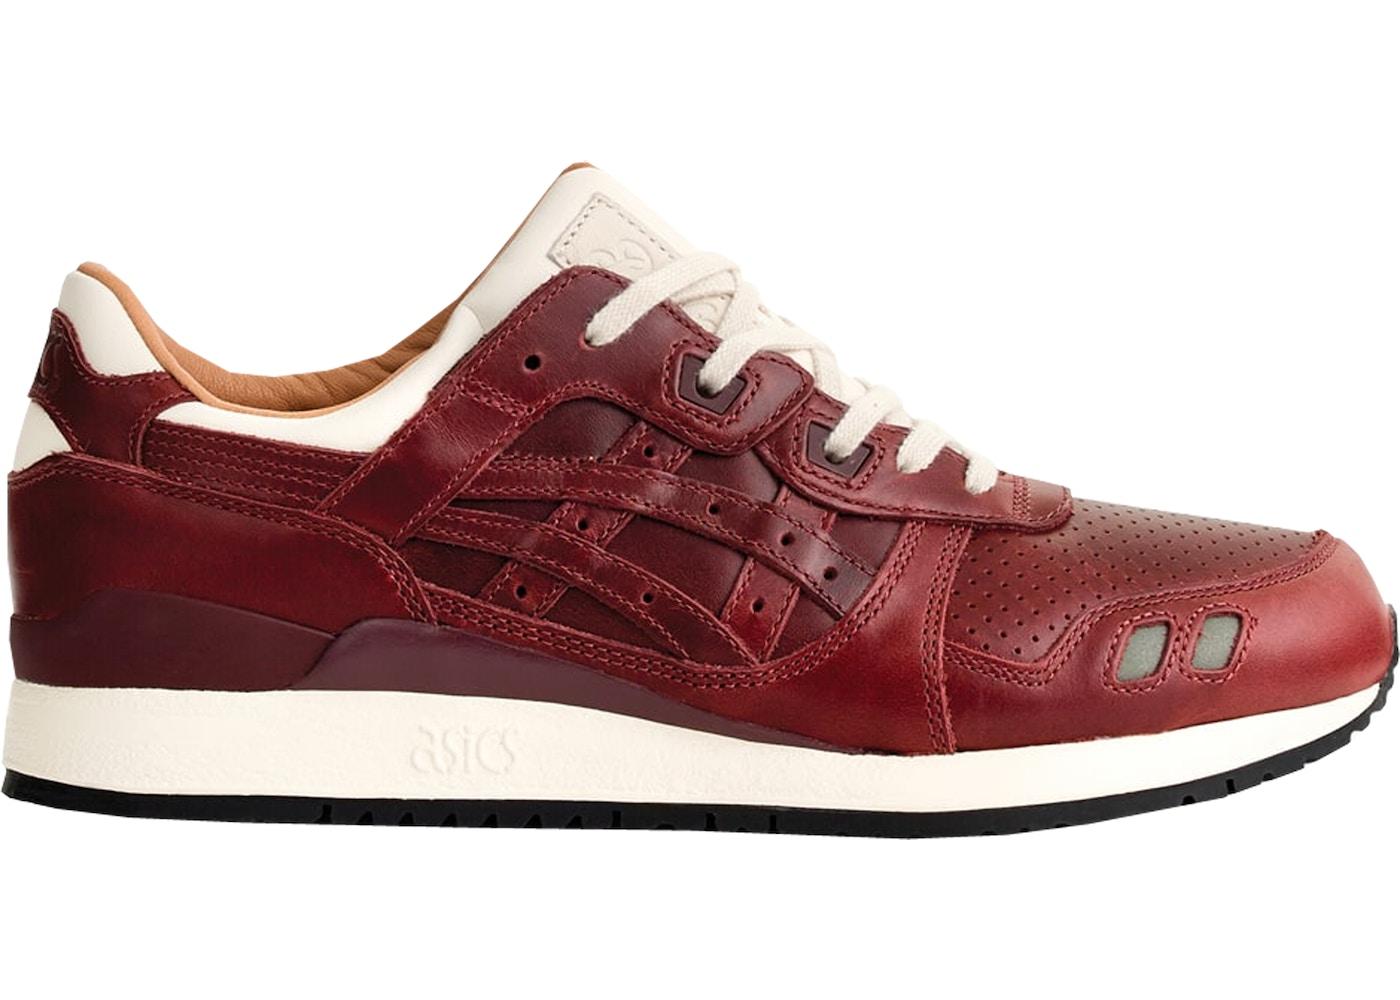 online retailer cc815 92ddf ASICS Gel-Lyte III Packer Shoes x J. Crew Oxblood Leather